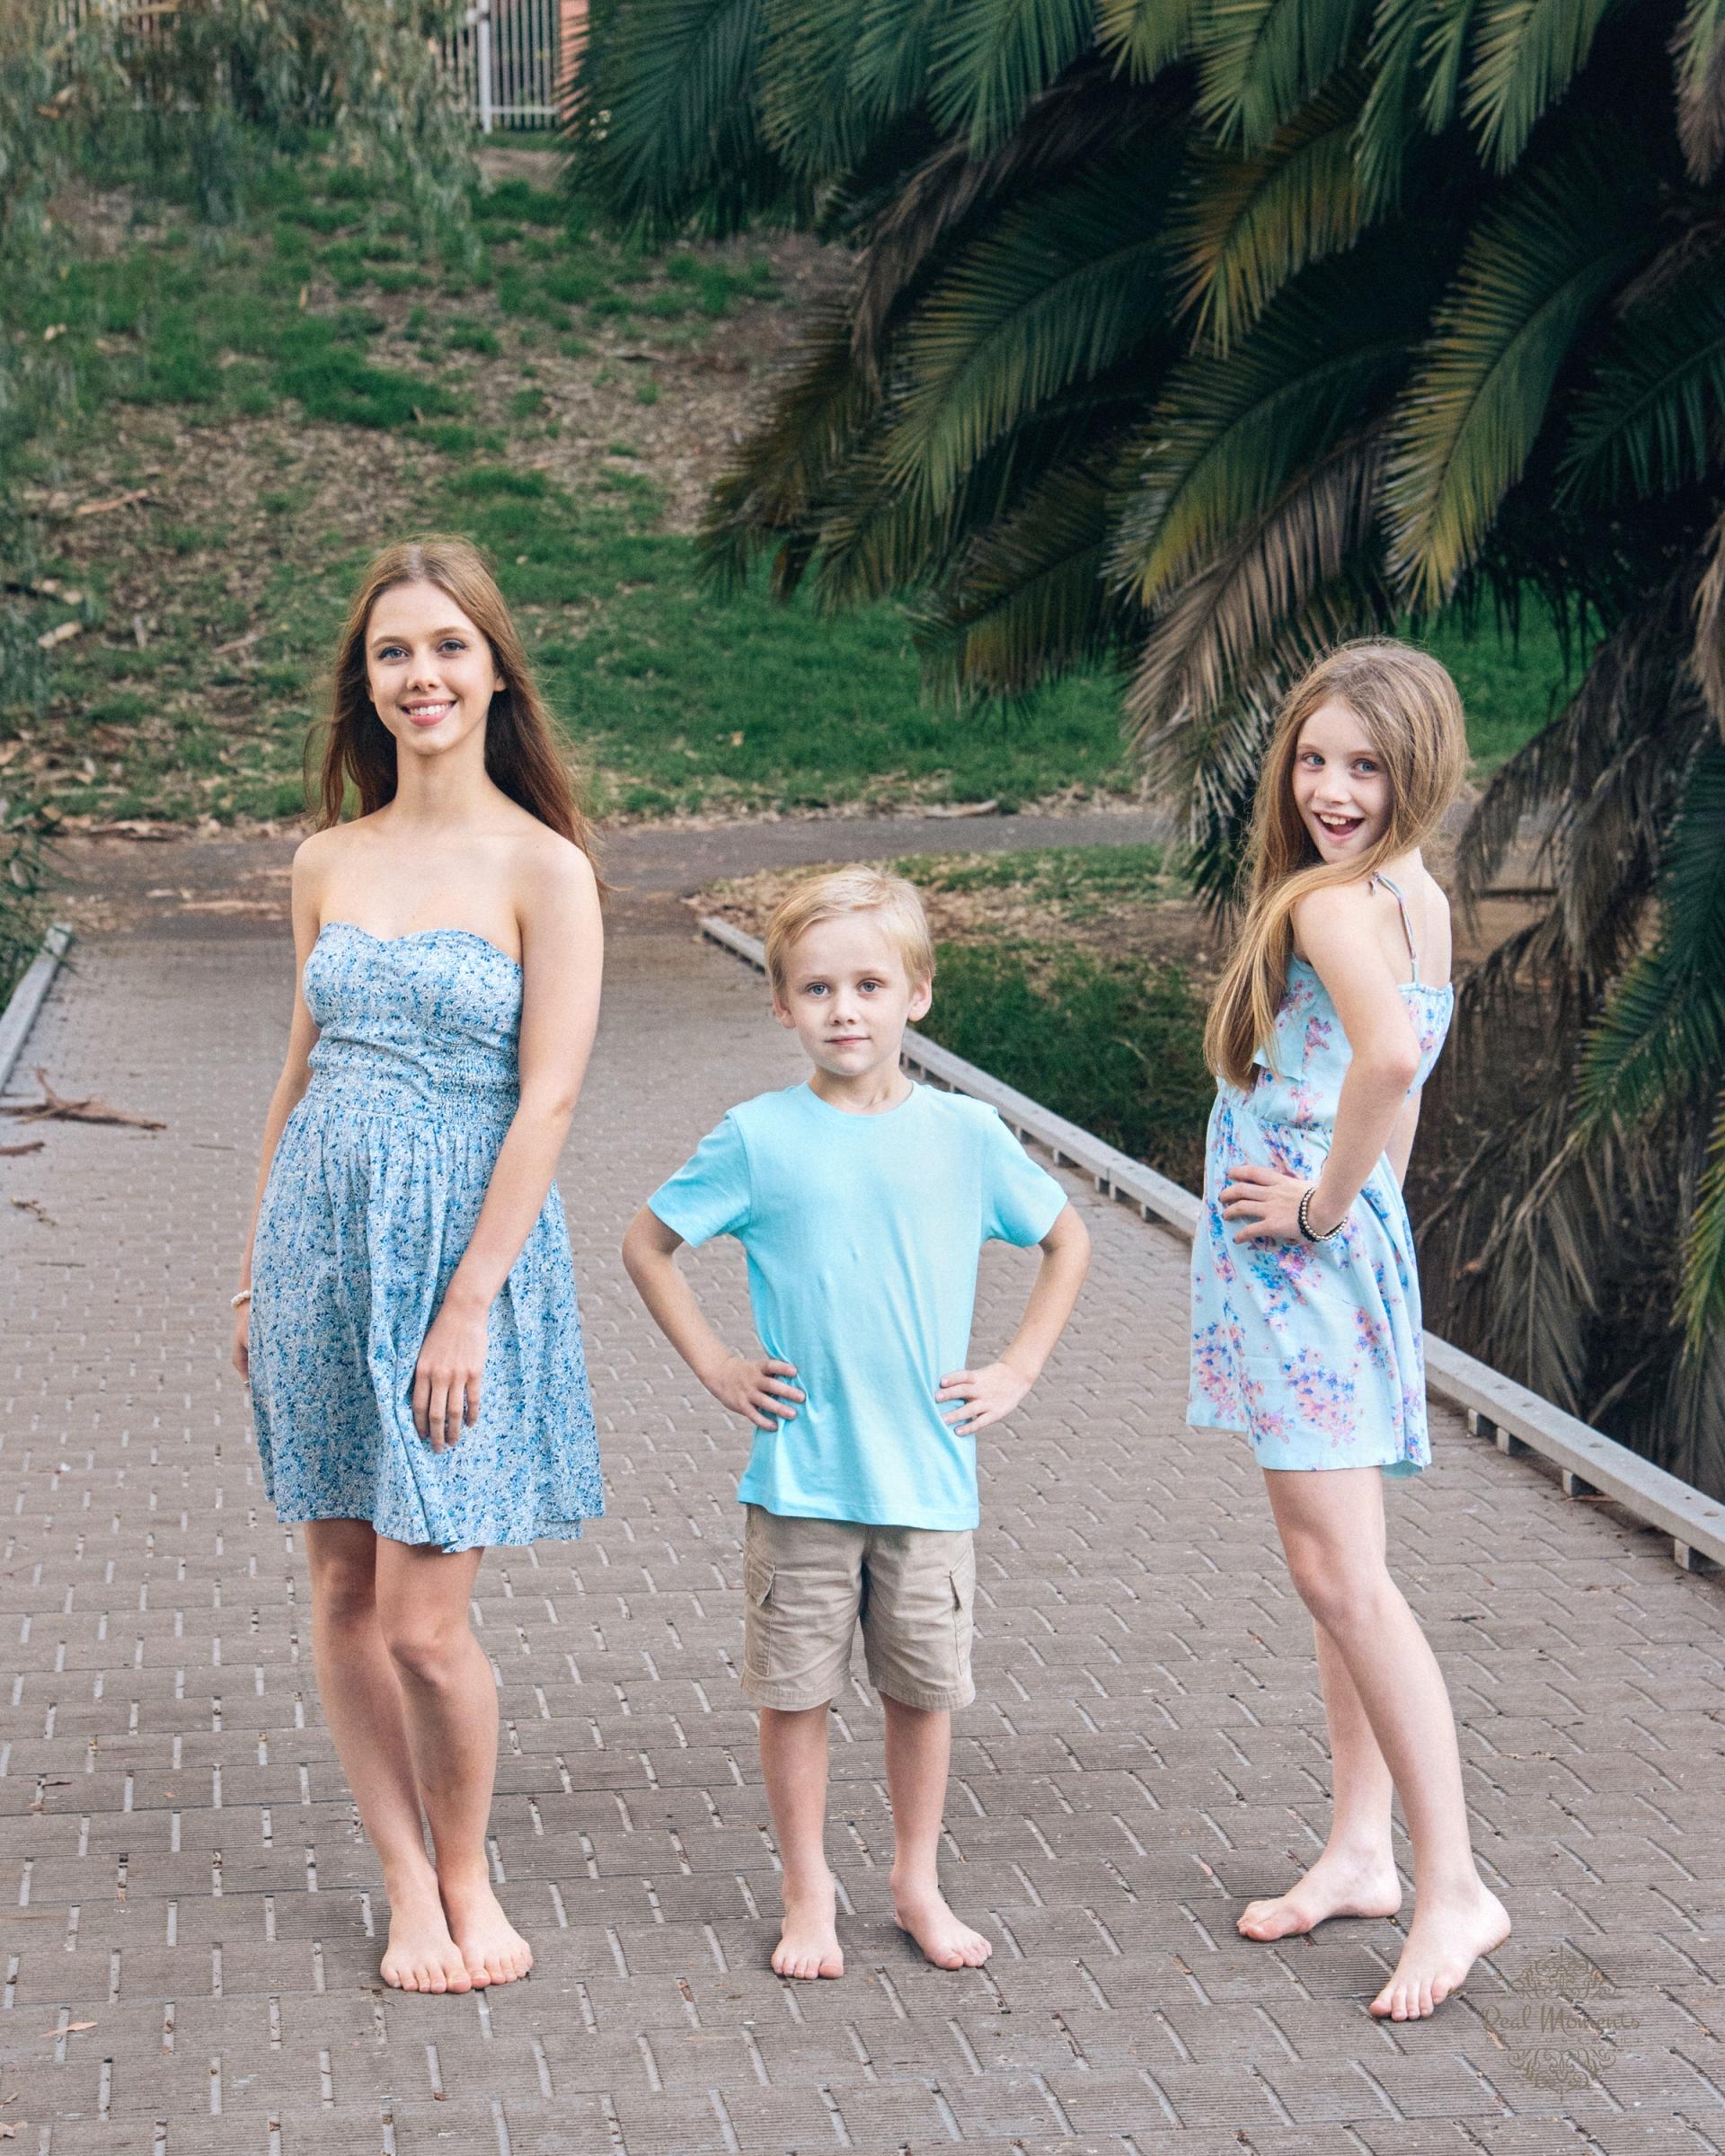 professional photographers Adelaide - children photography